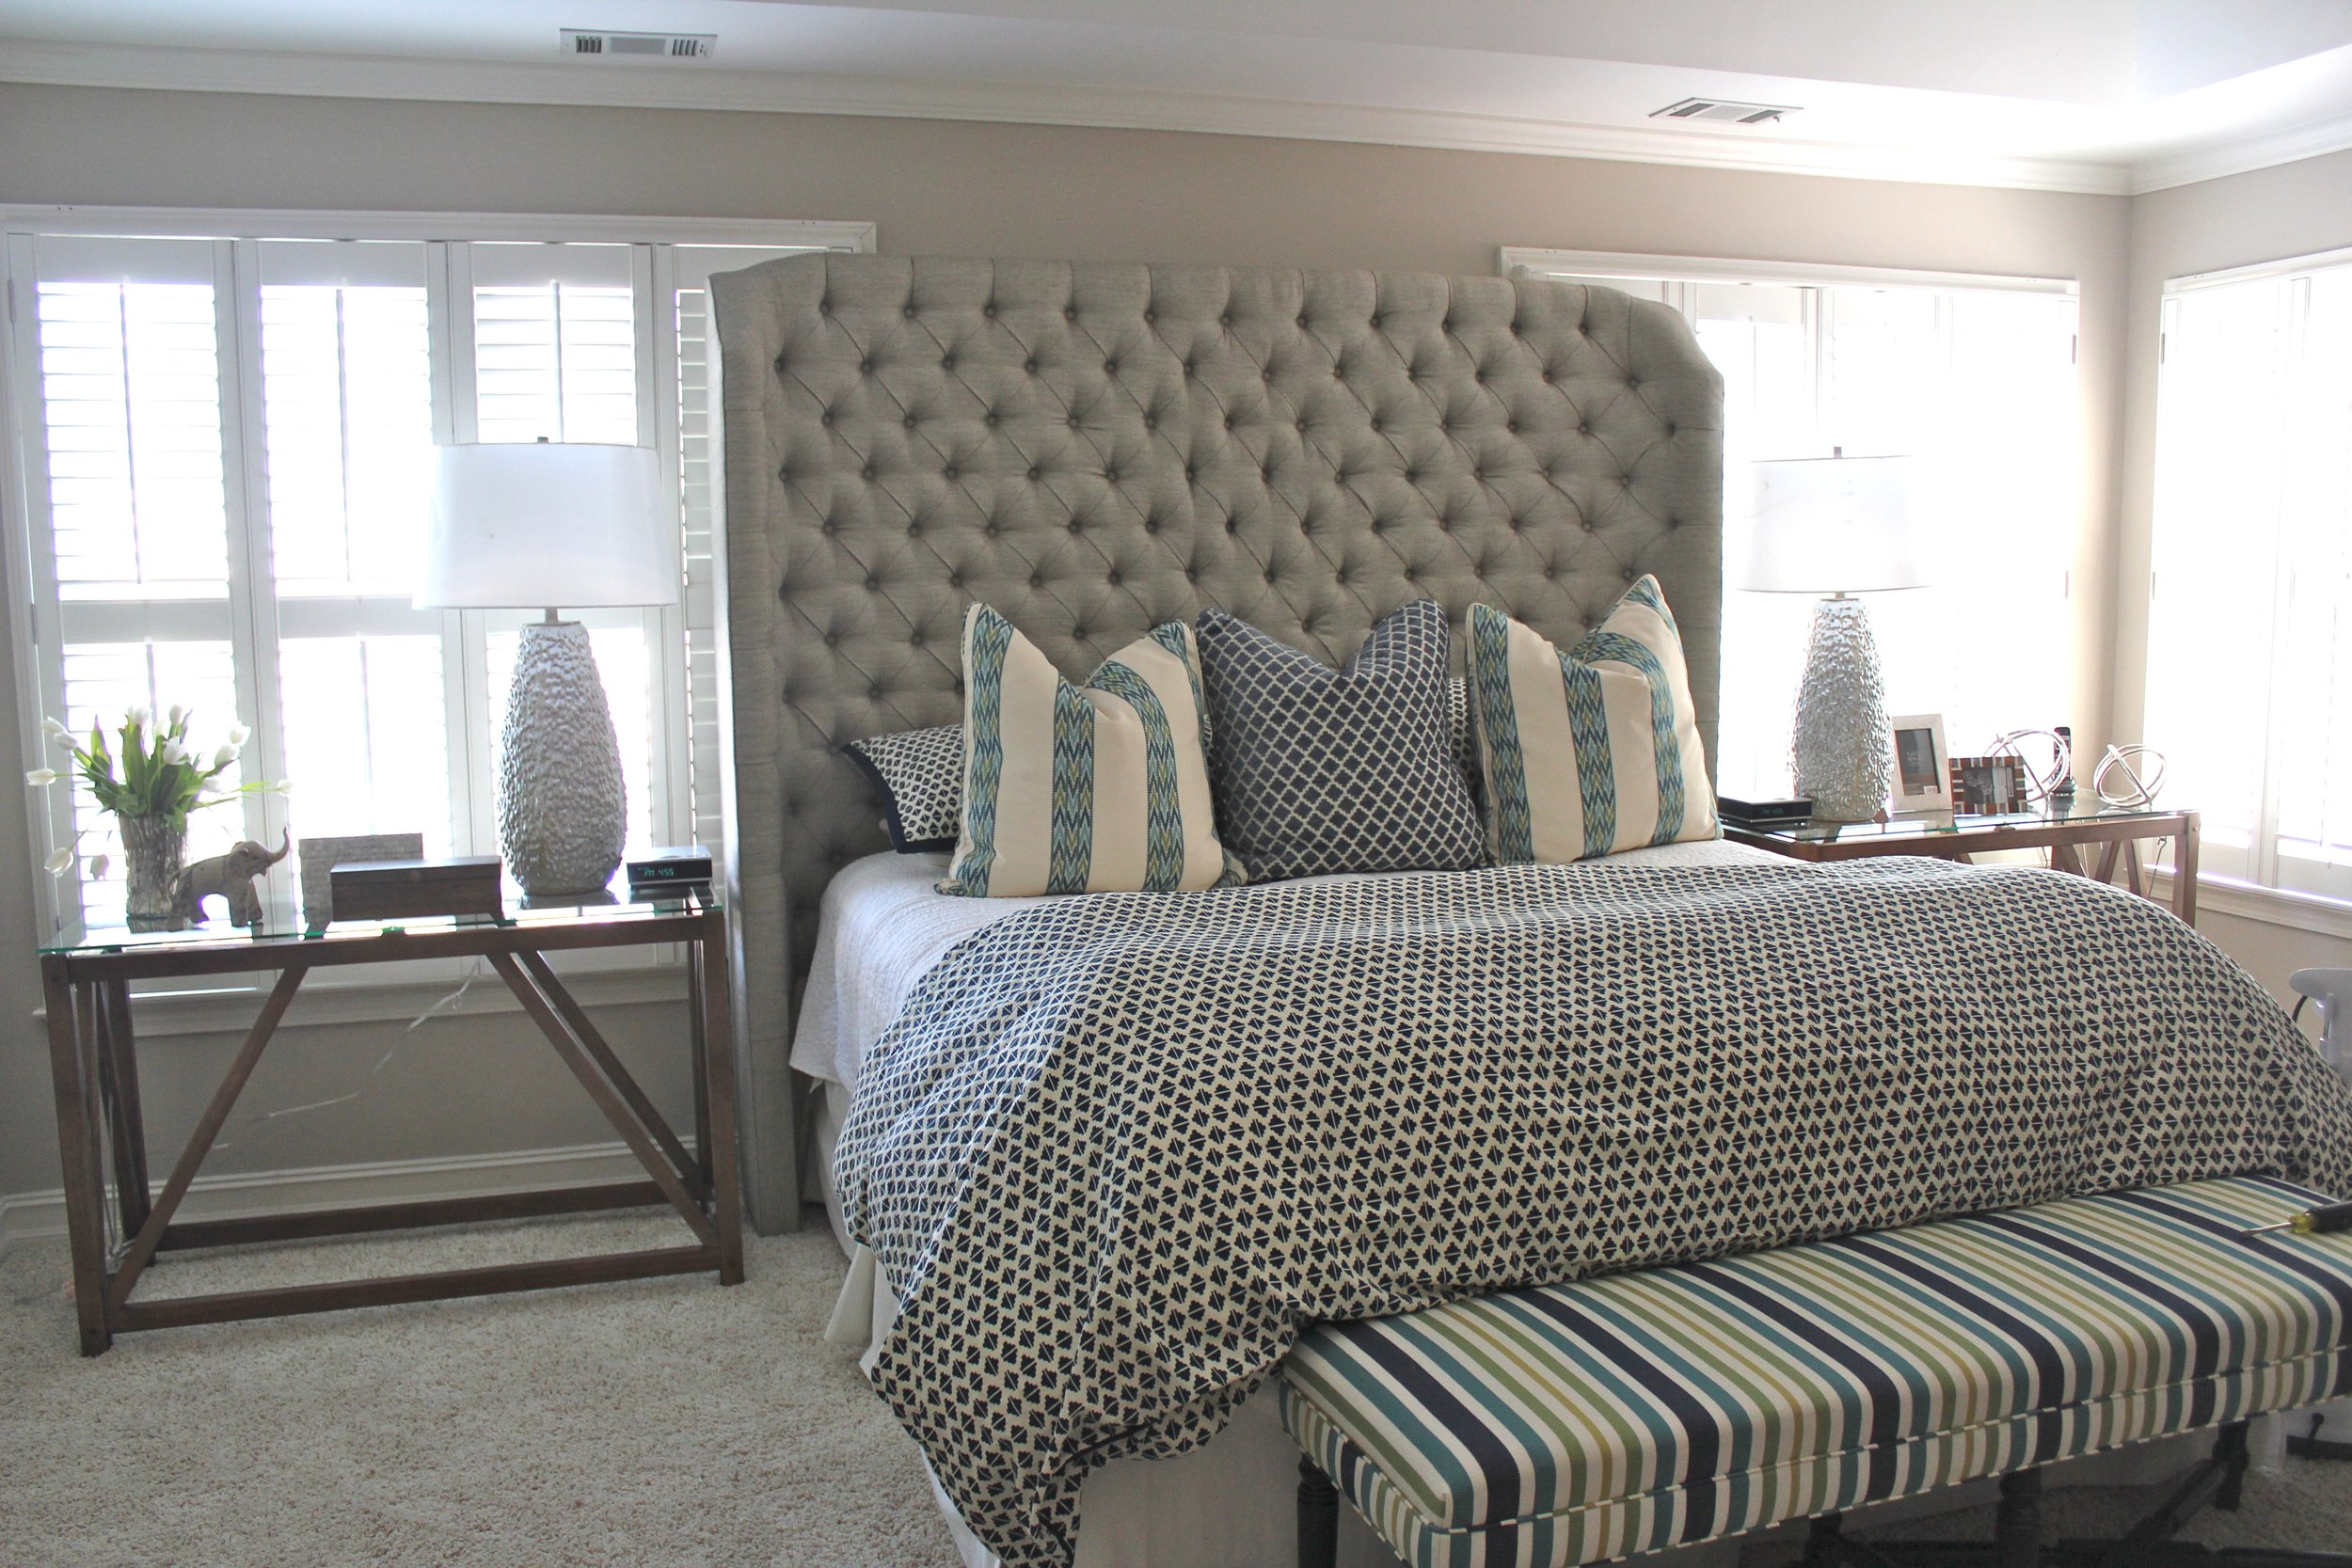 Dayka Robinson Custom Tufted 8'  wraparound headboard bedroom.jpg